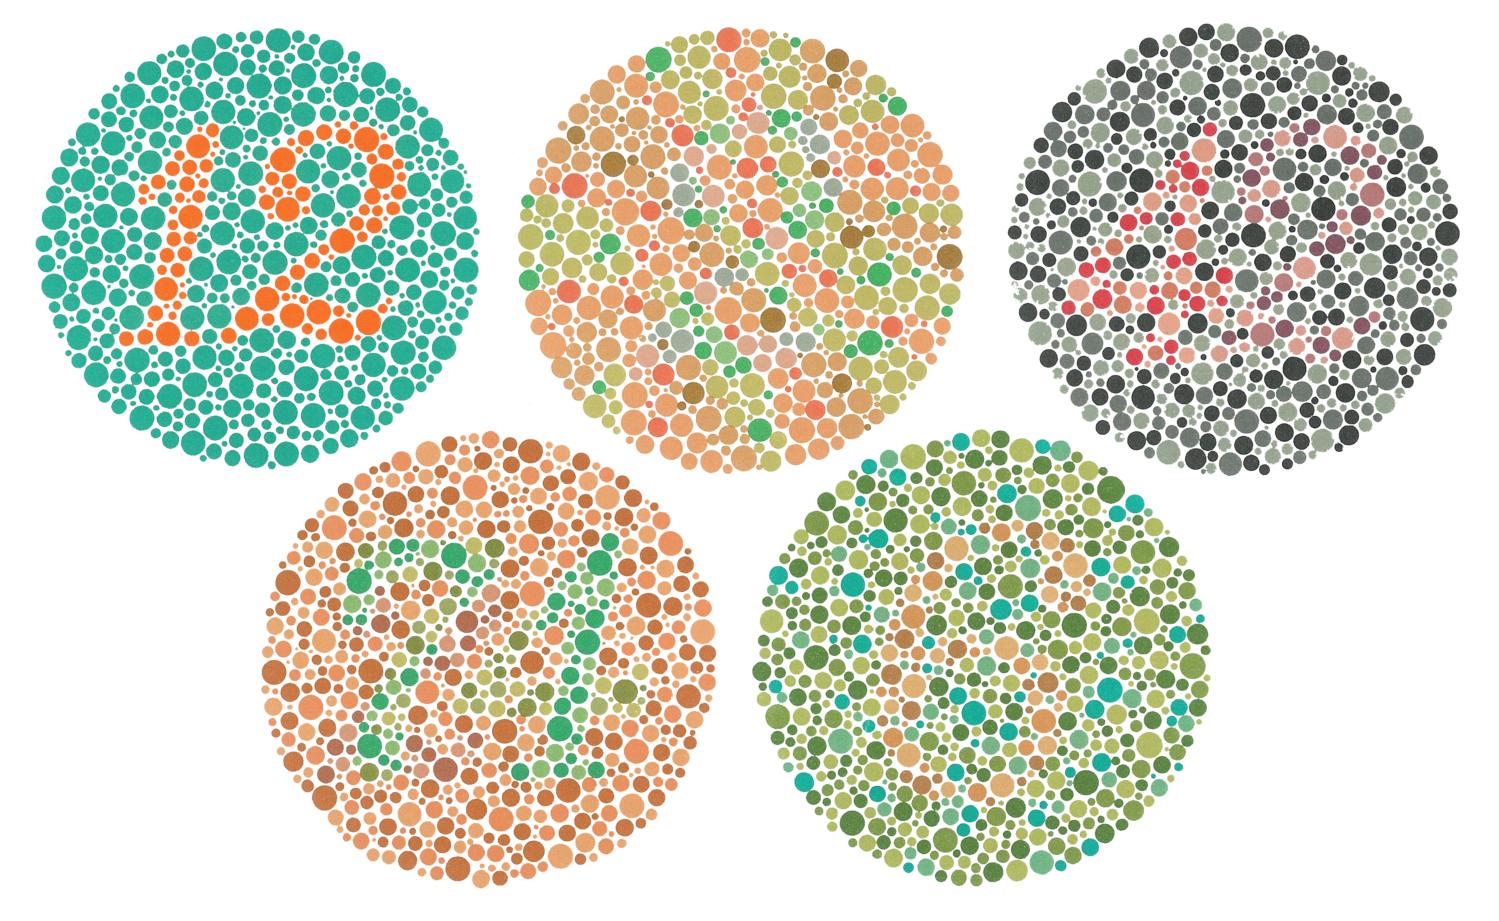 b414bff16c4 My Birthday Colorblind AMA